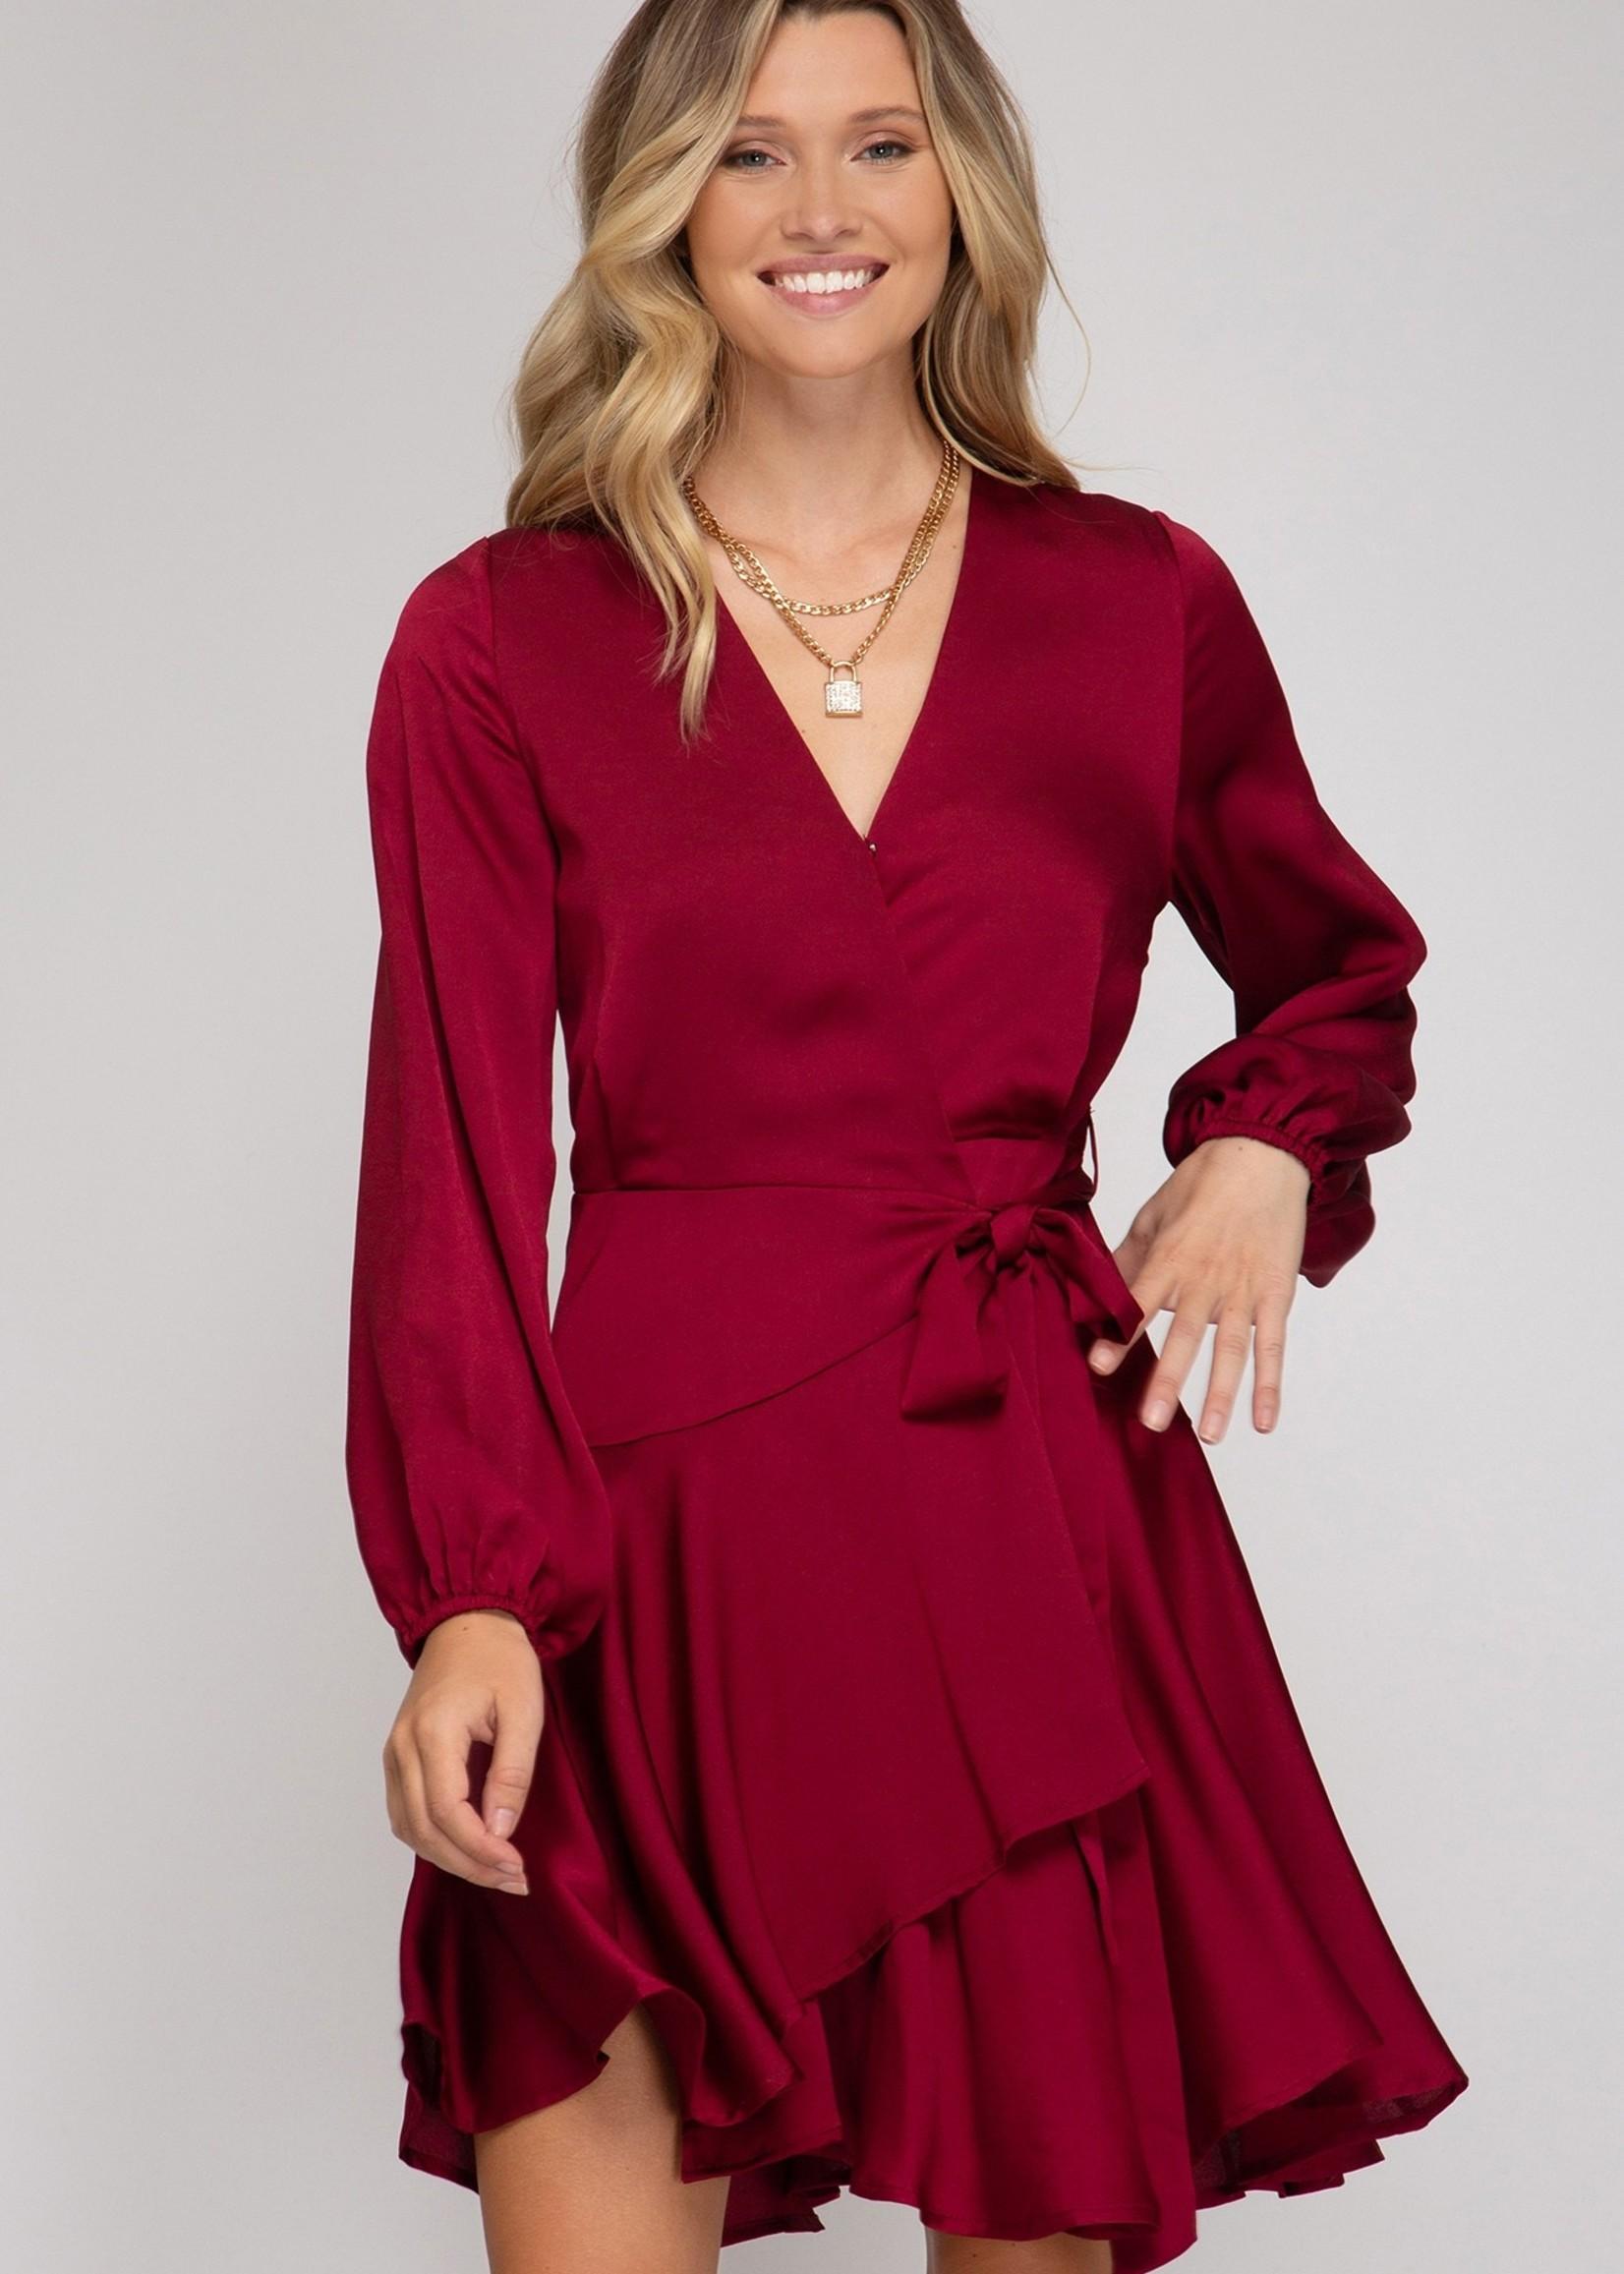 Long Sleeve Satin Wrap dress - Wine